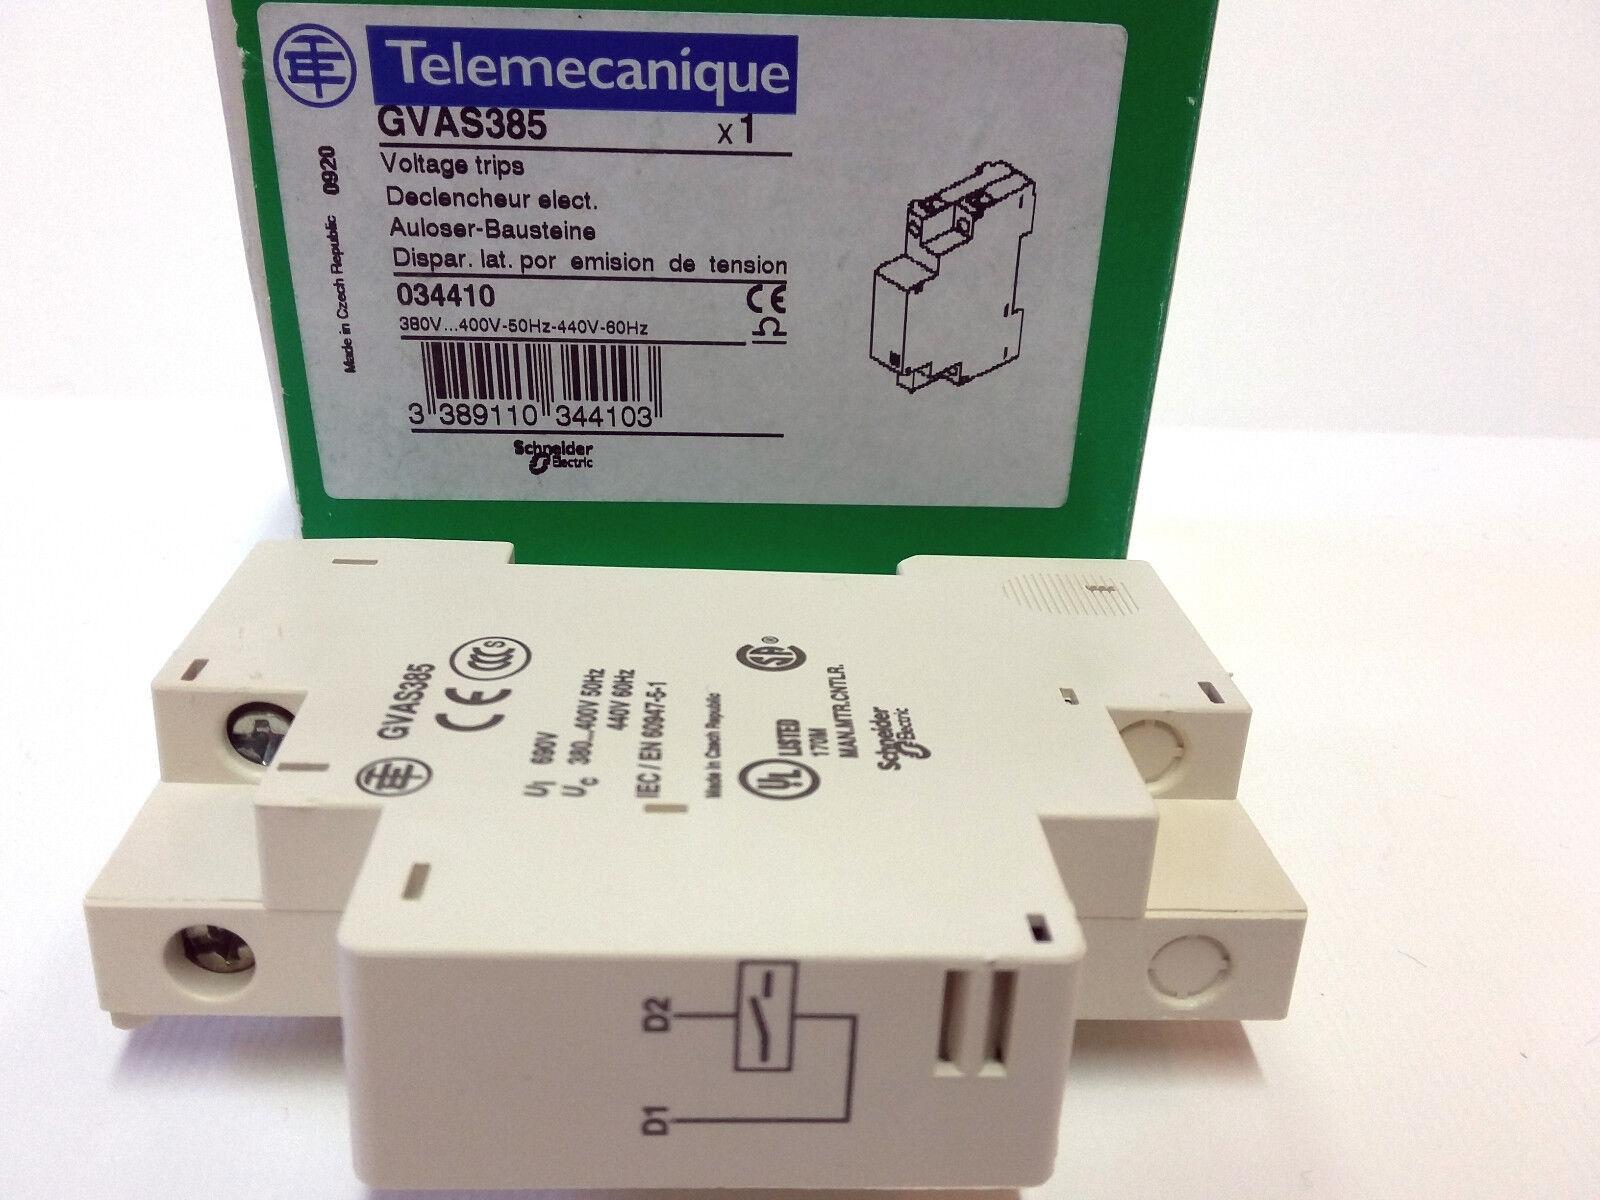 Telemecanique Schneider Electric GVAS385 Voltage Trip 380-400V//50Hz 440V//60Hz